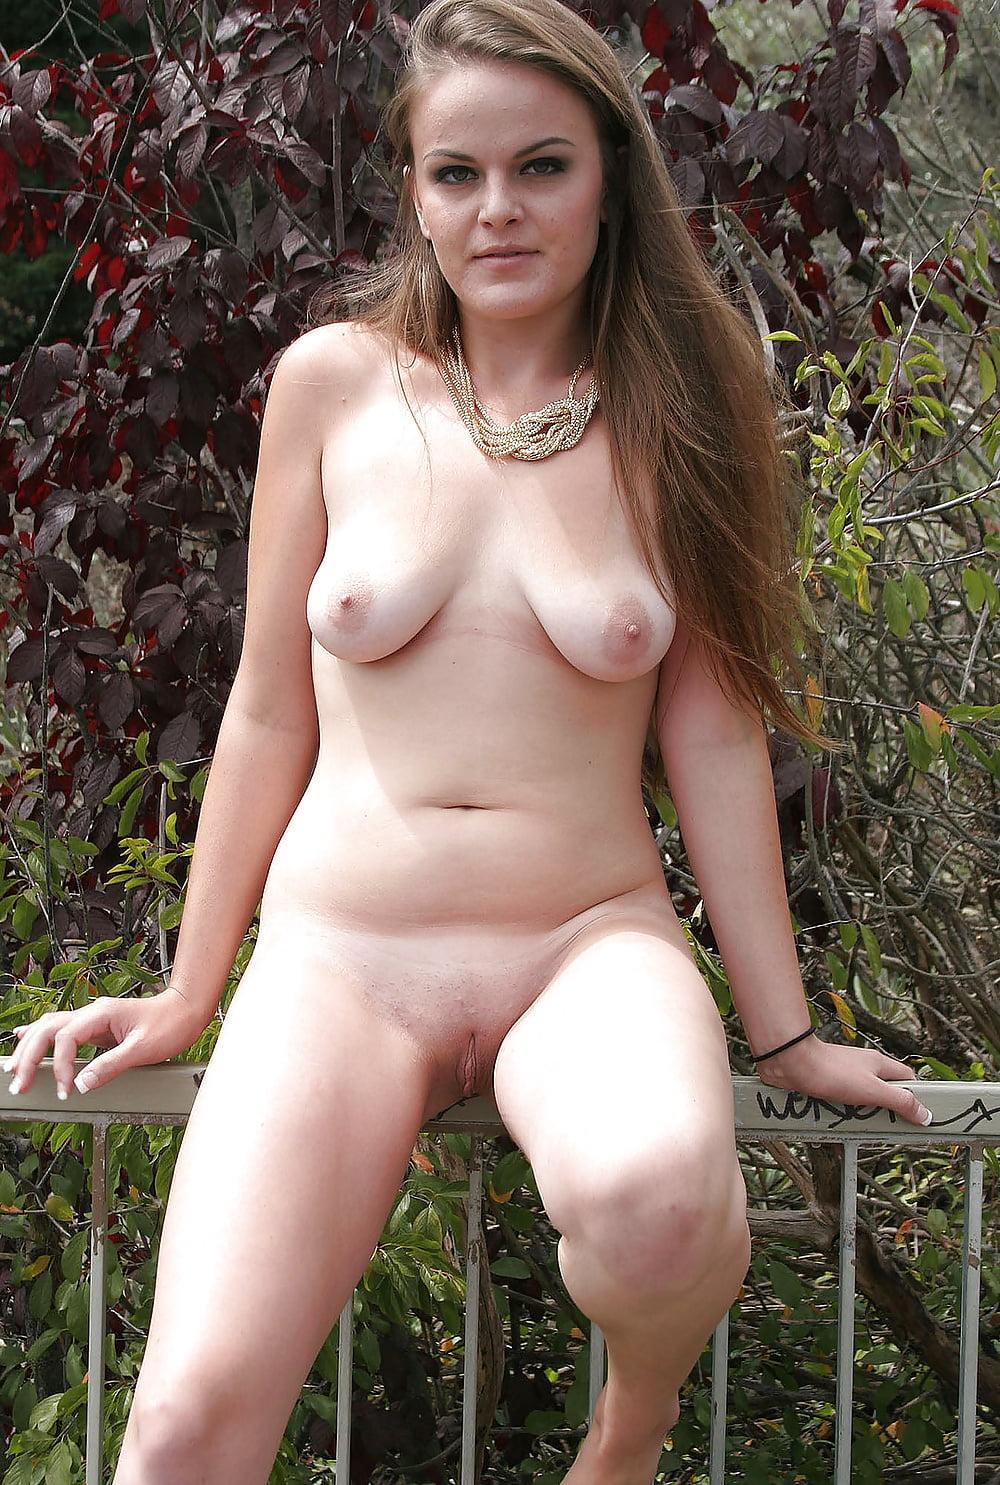 Older nude woman pics